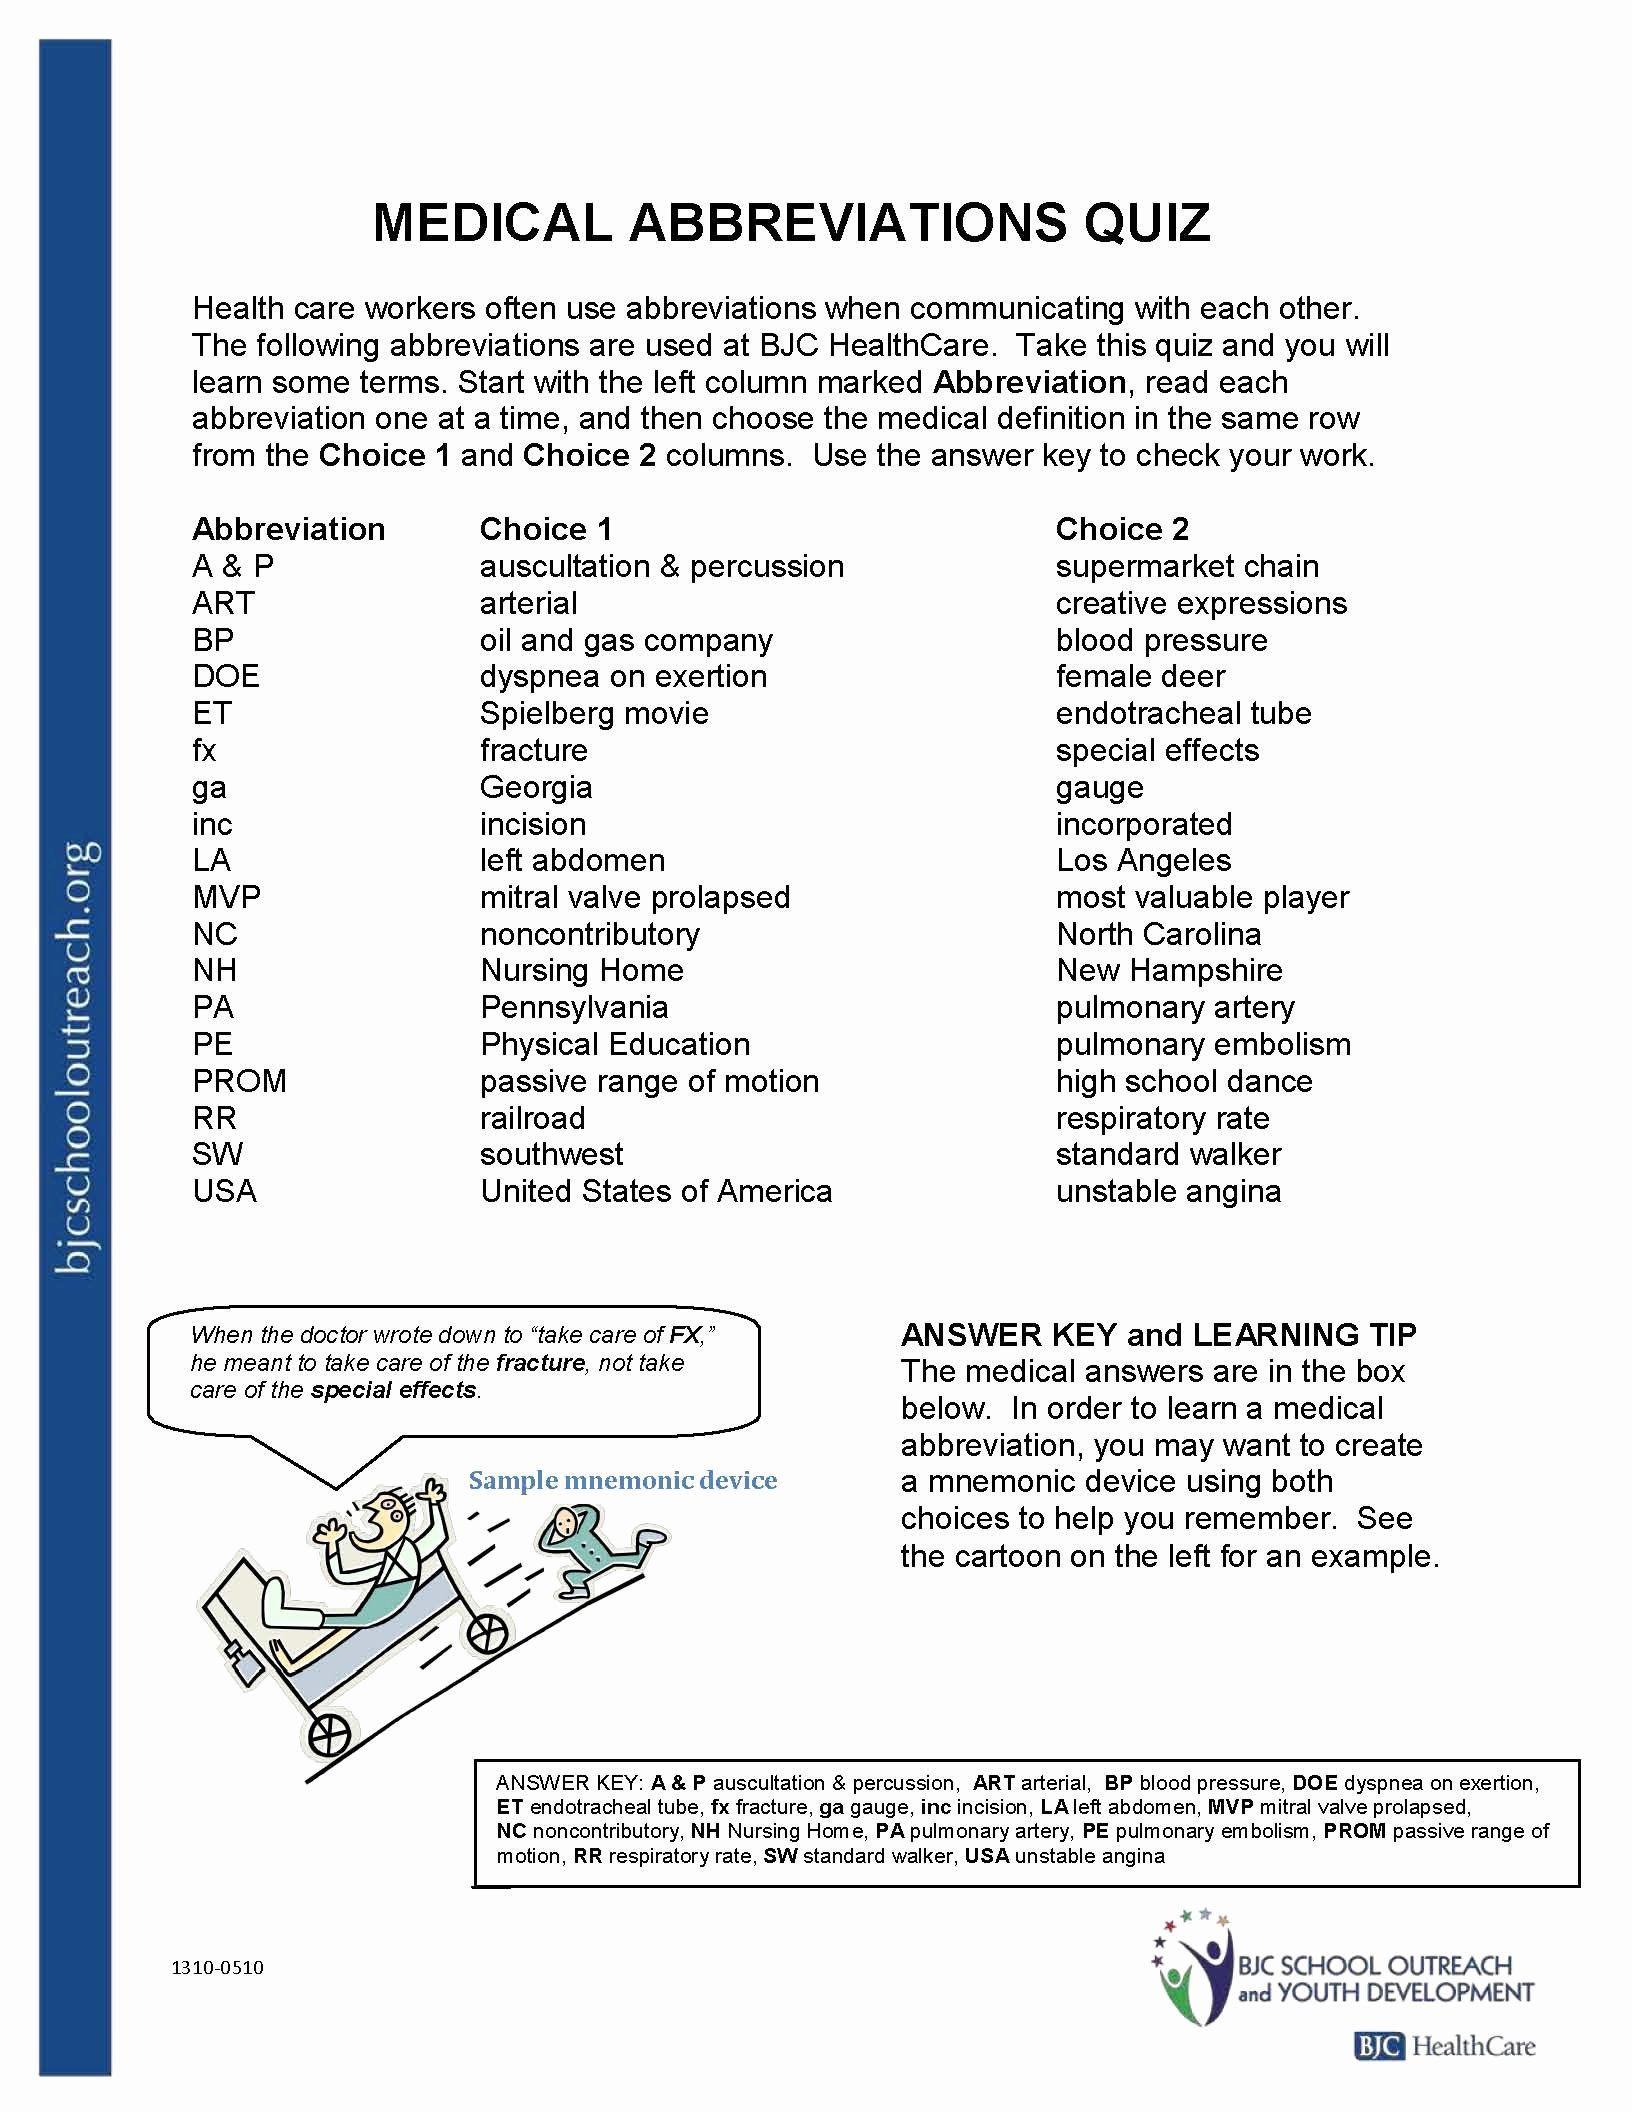 Medical Terminology Abbreviations Worksheet Medical Terminology Abbreviations Worksheet New Awesome